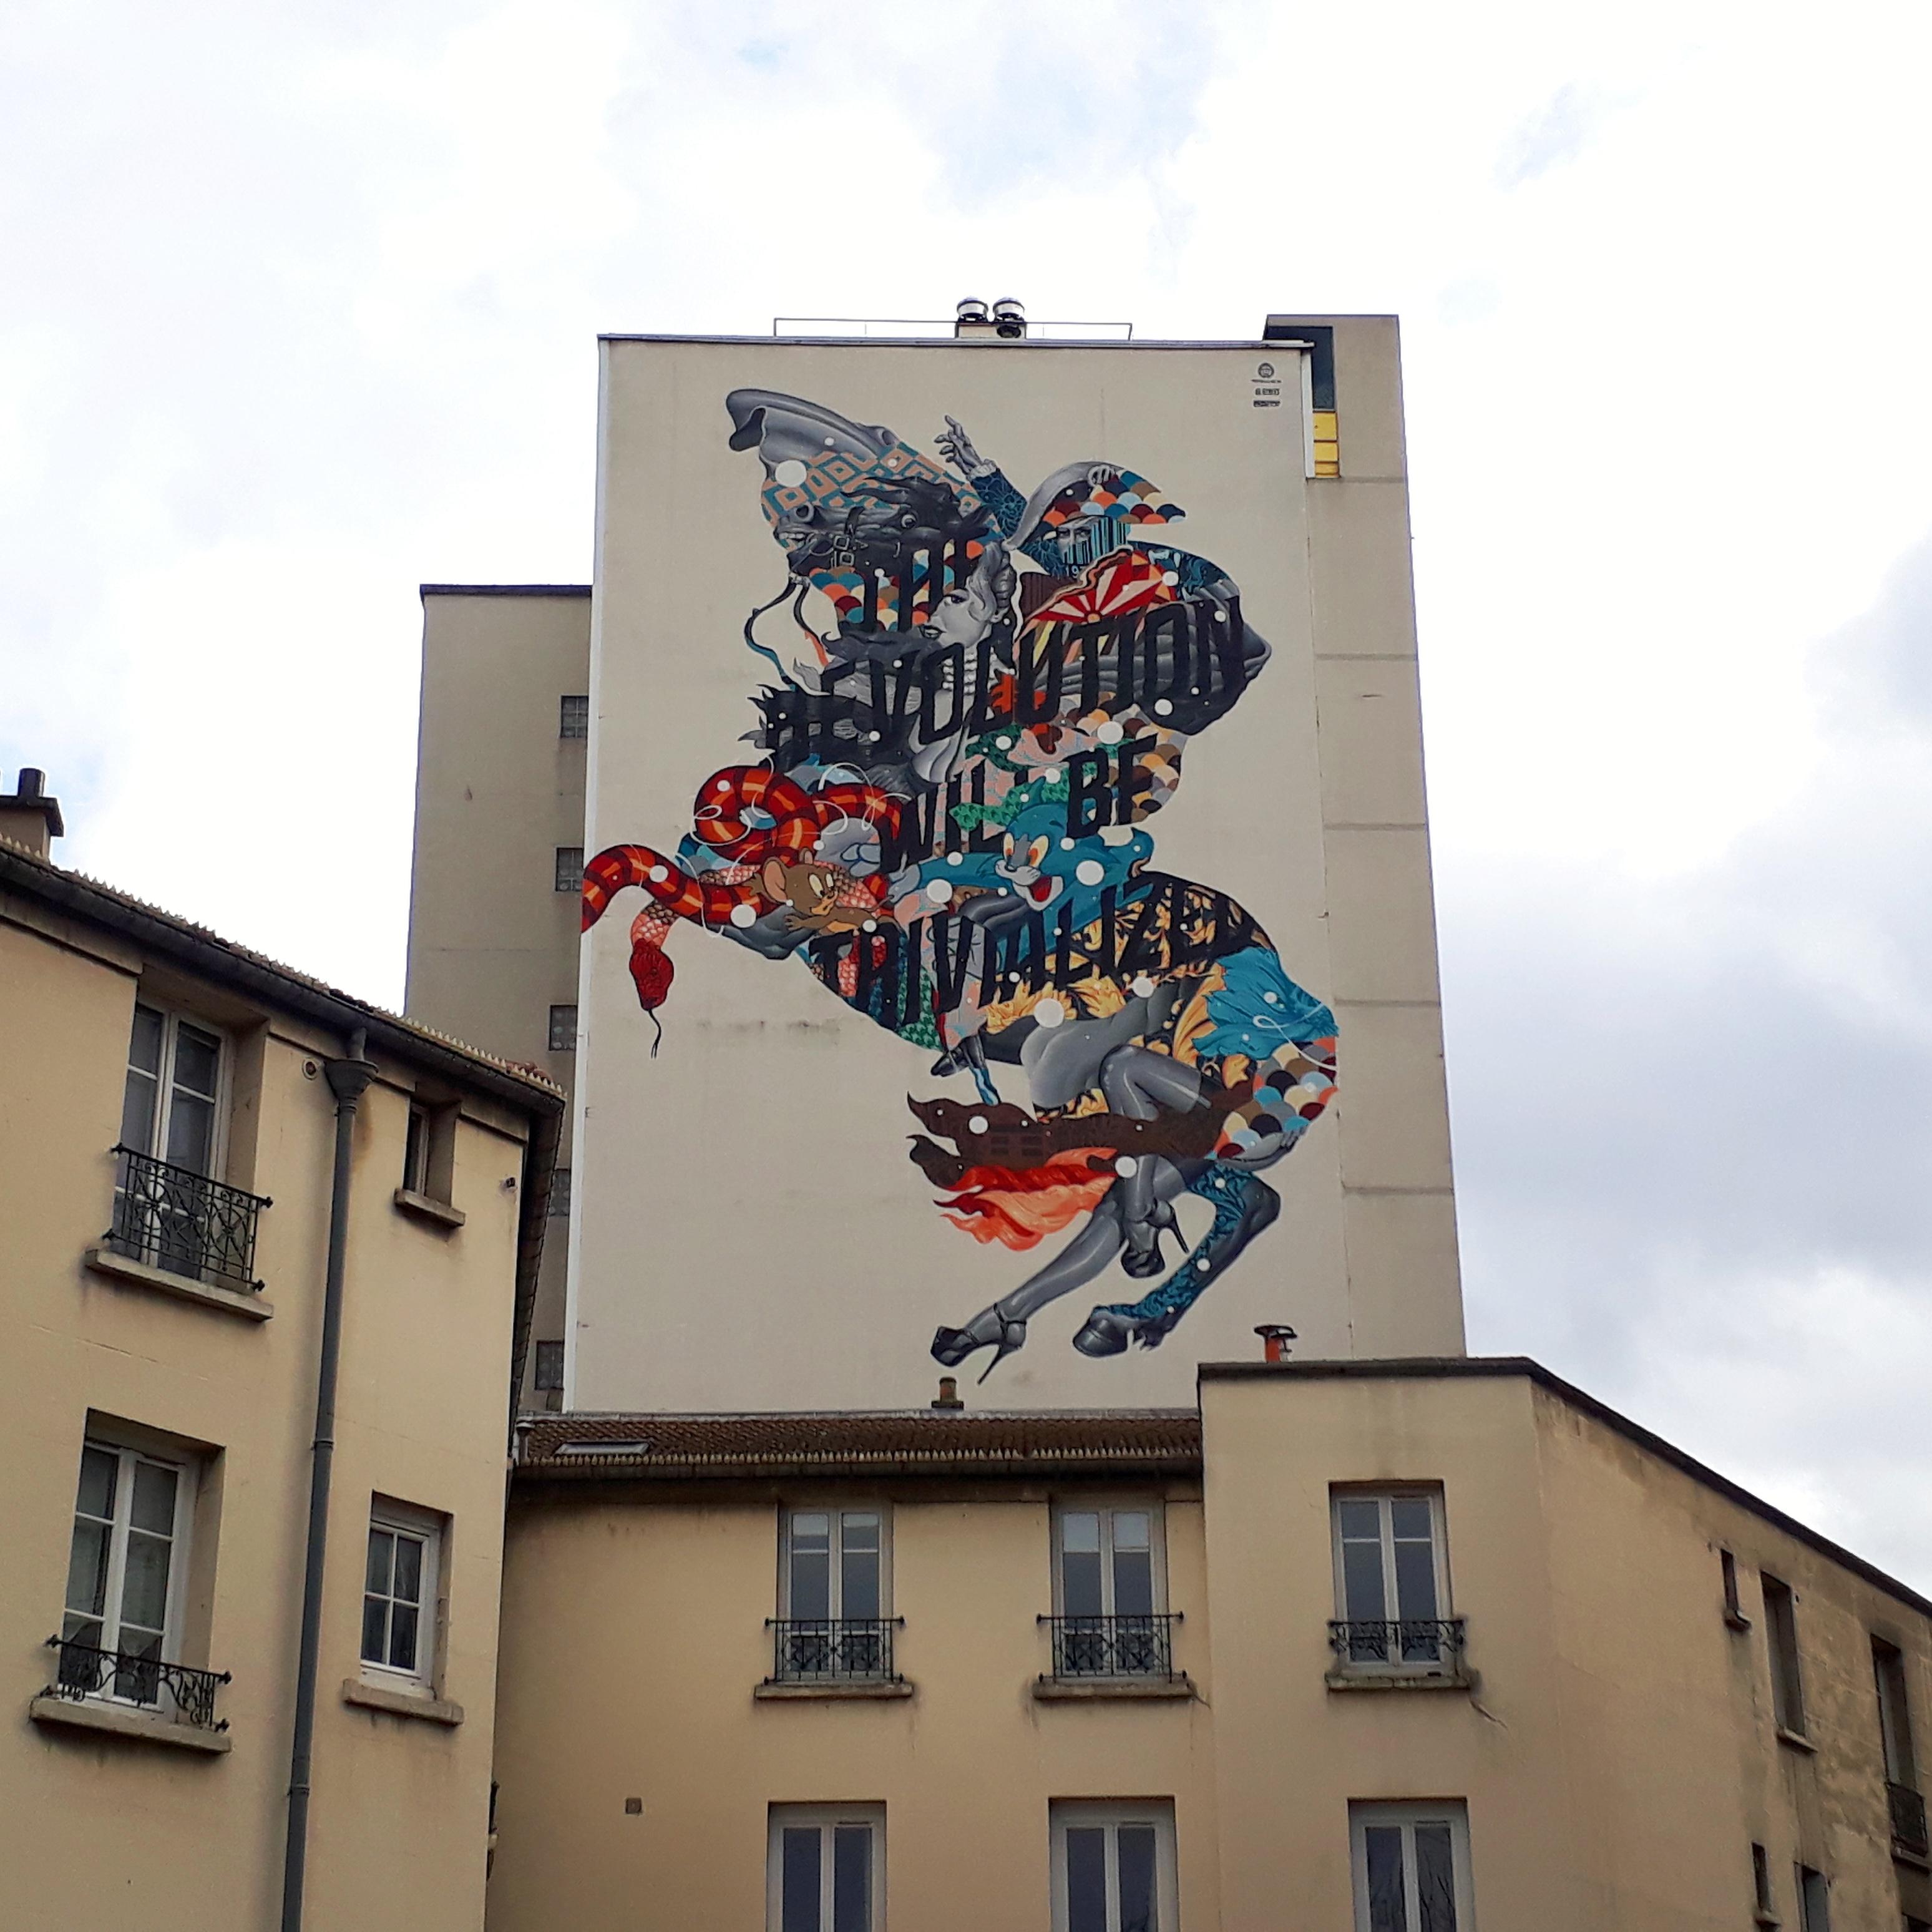 Oeuvre du street artiste Tritant-Eaton